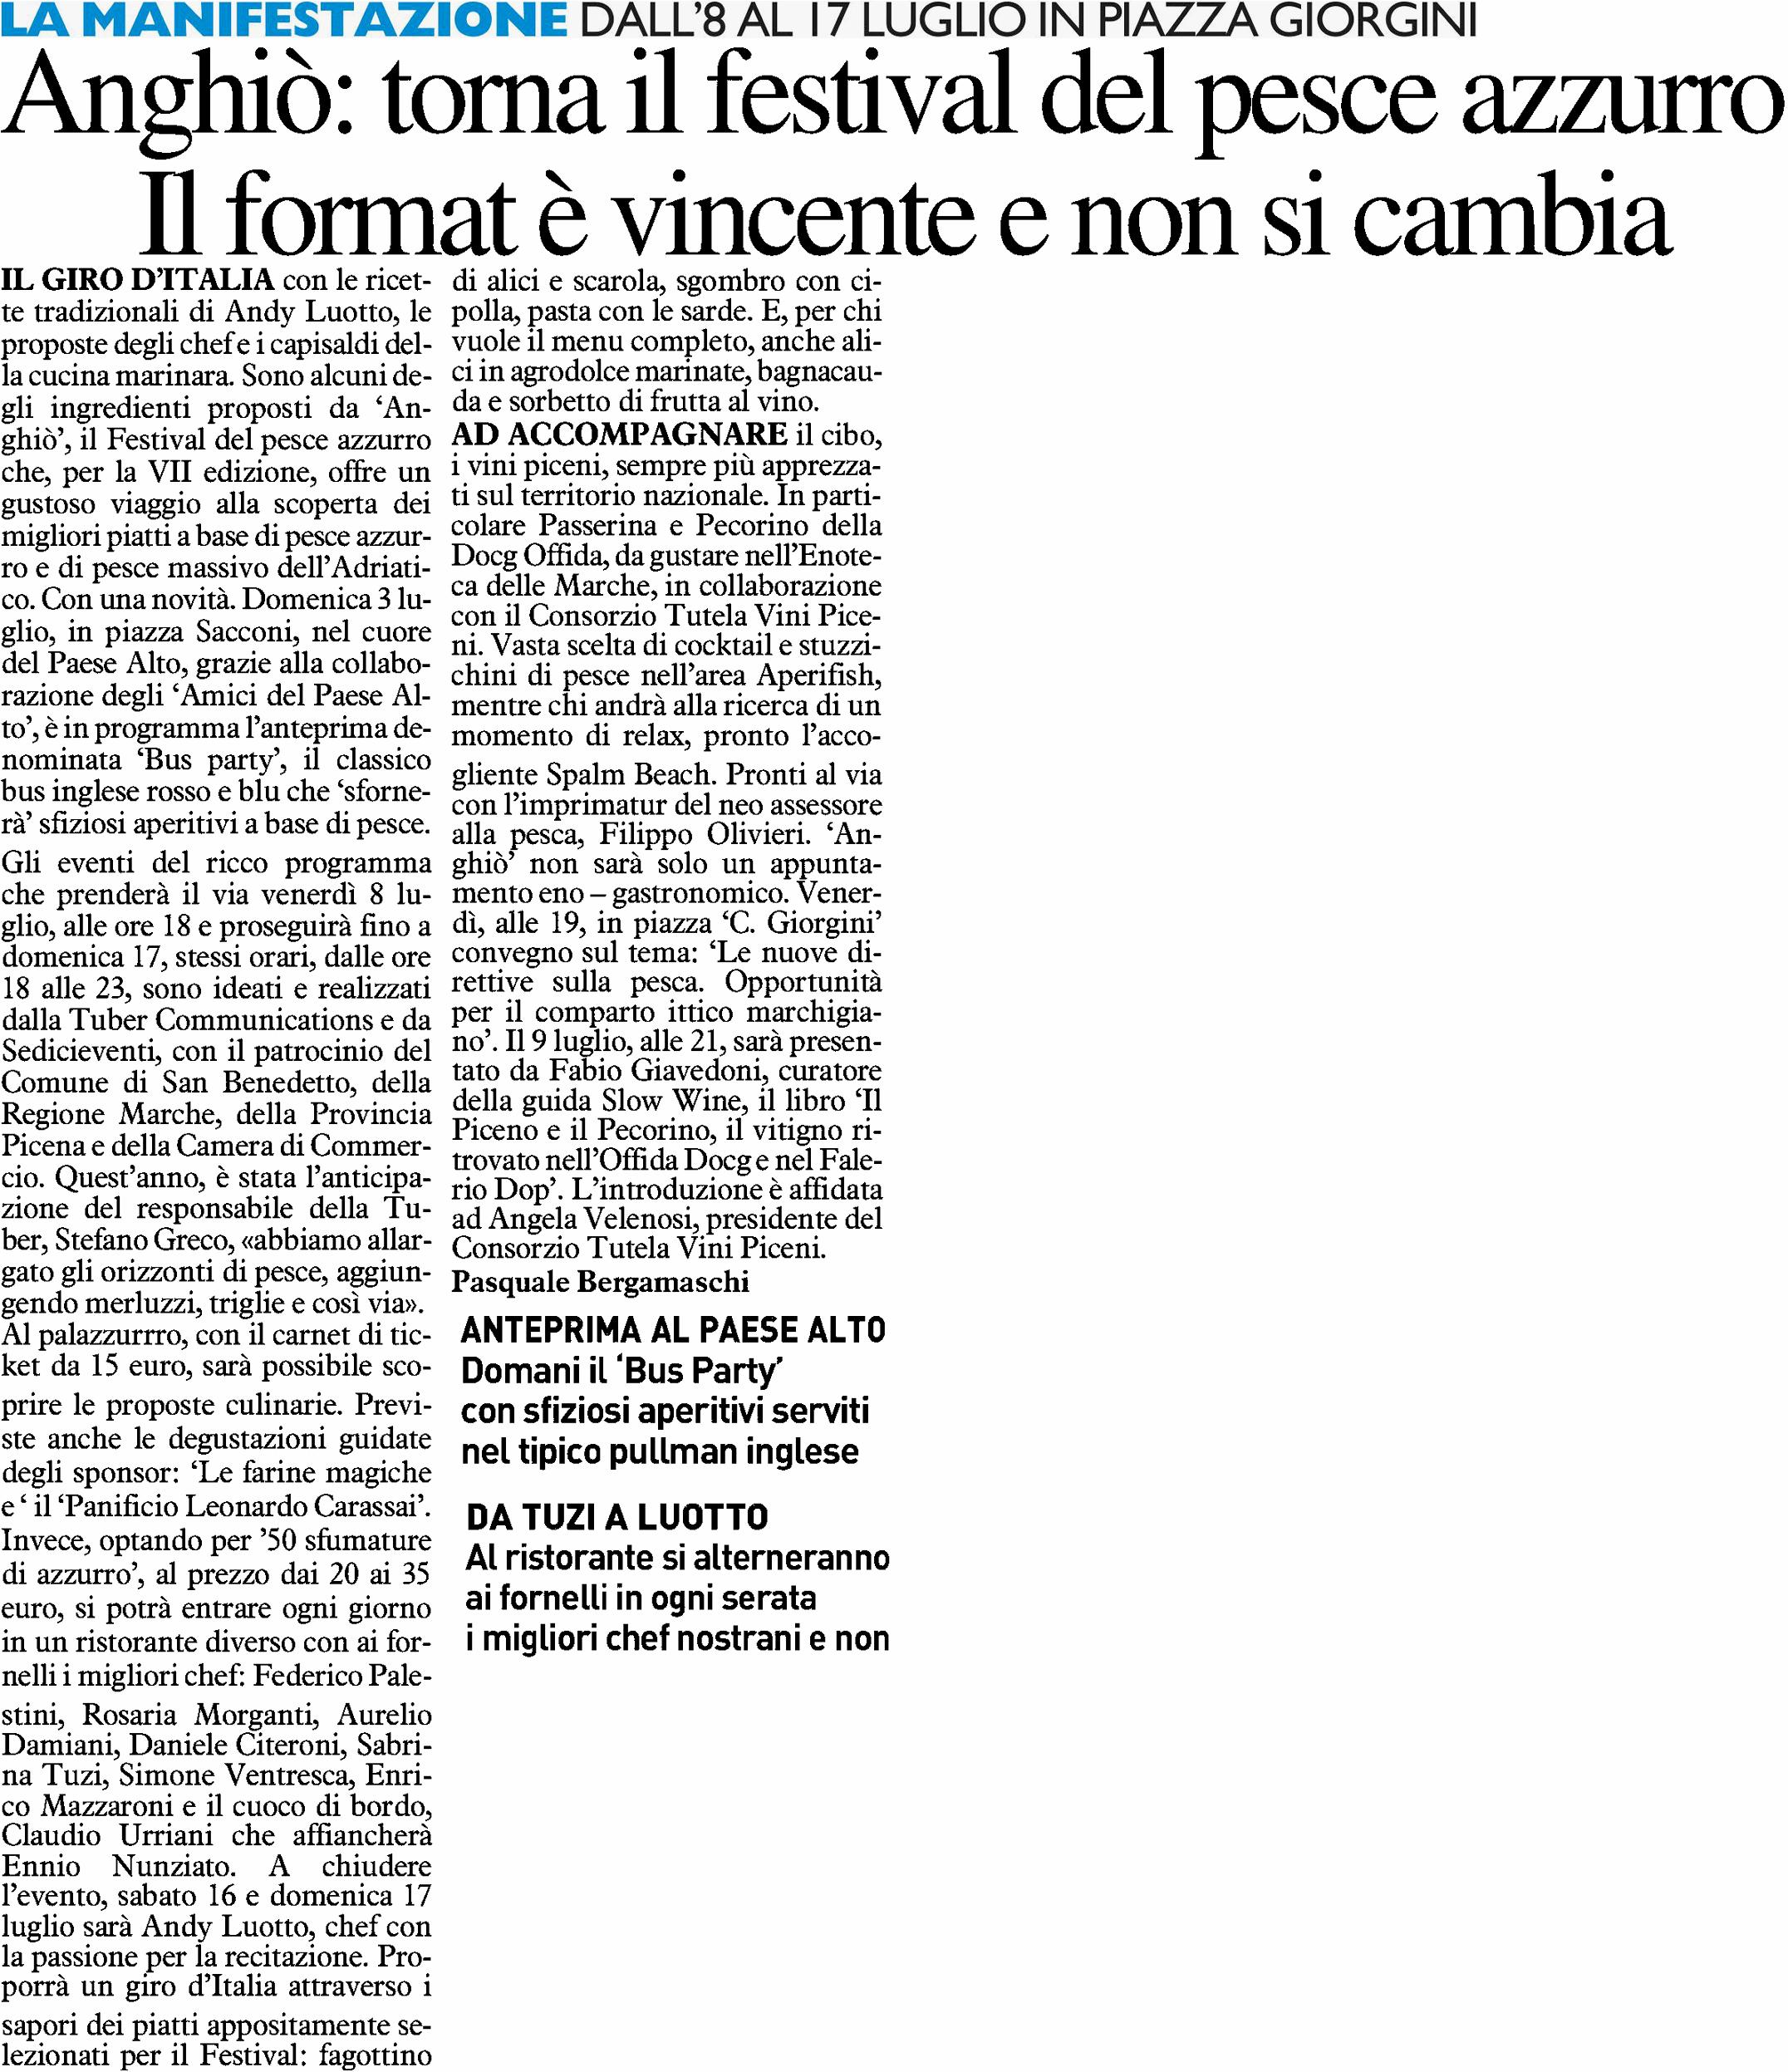 02.07.16_ilrestodelCarlinoAscoli1